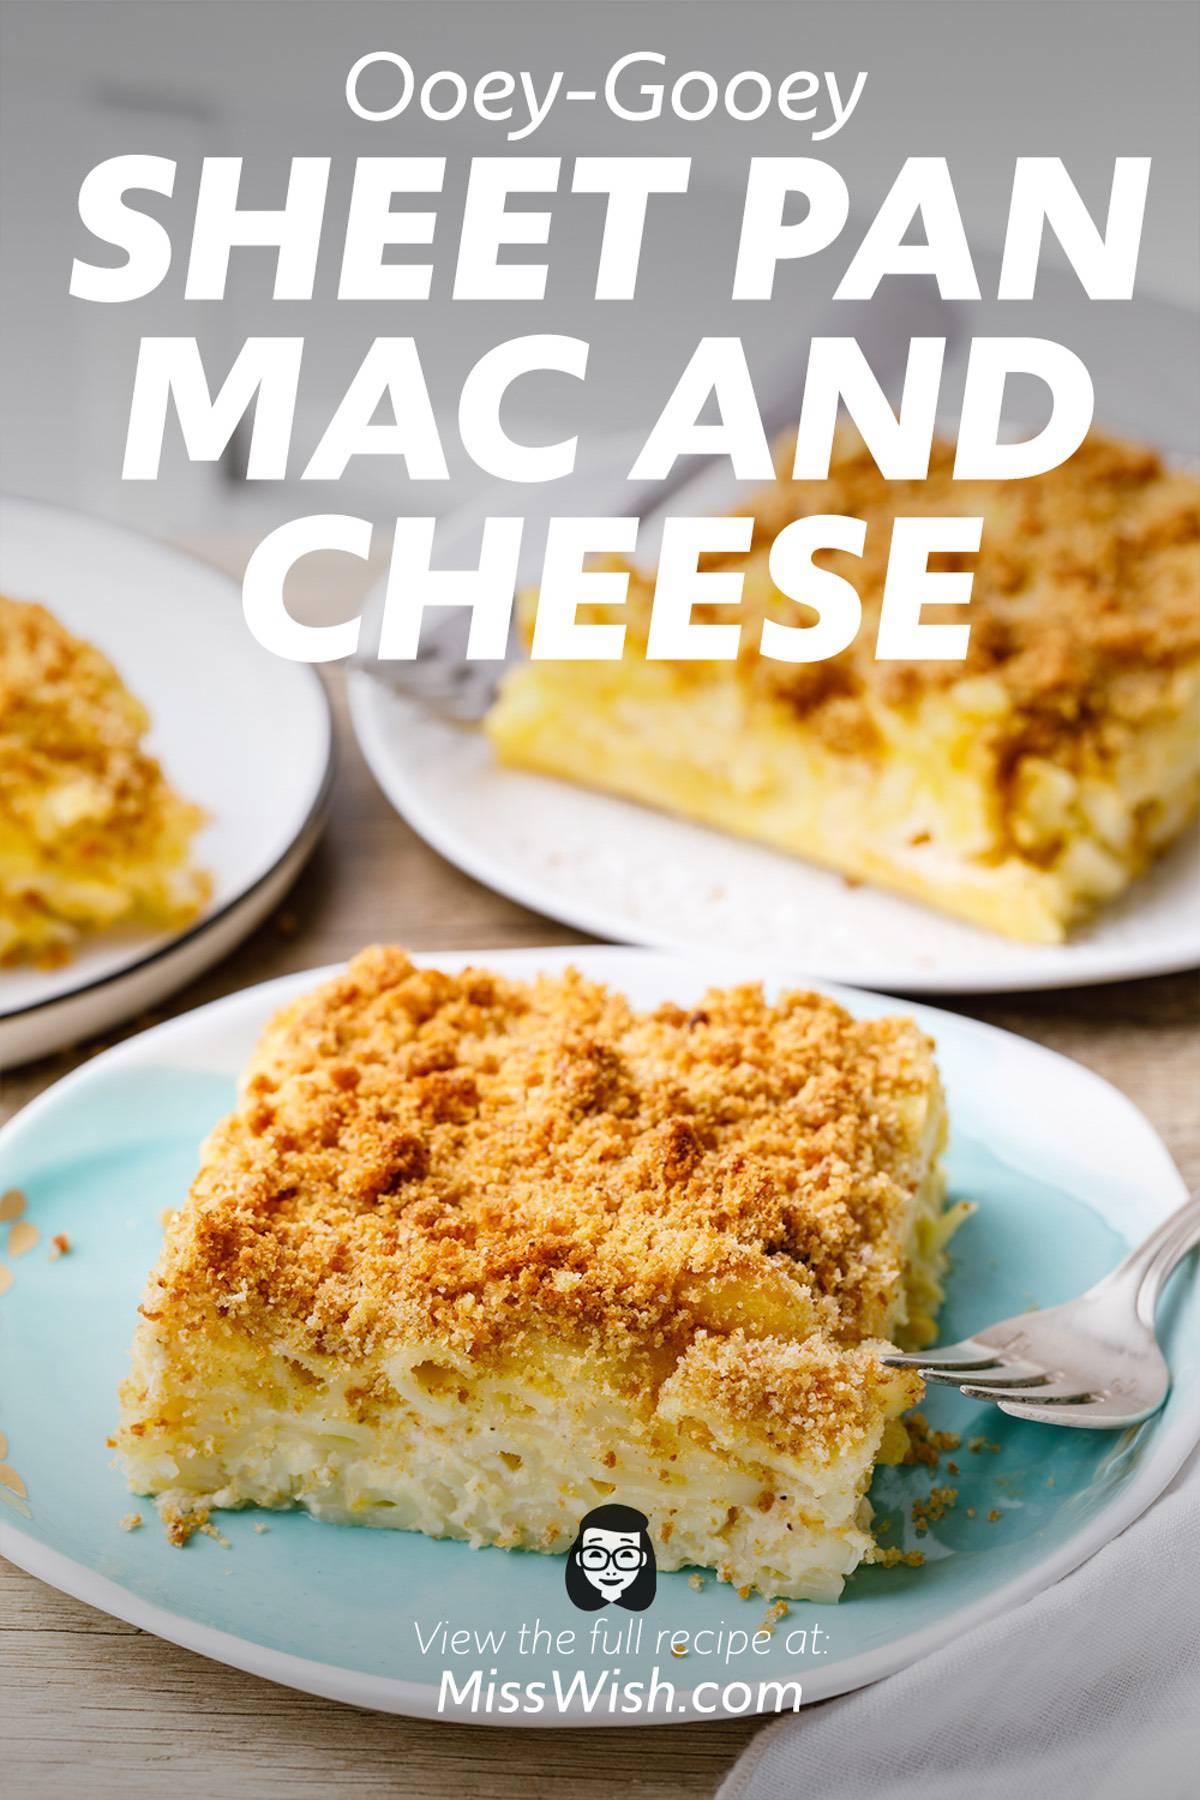 Ooey-Gooey Sheet Pan Mac And Cheese